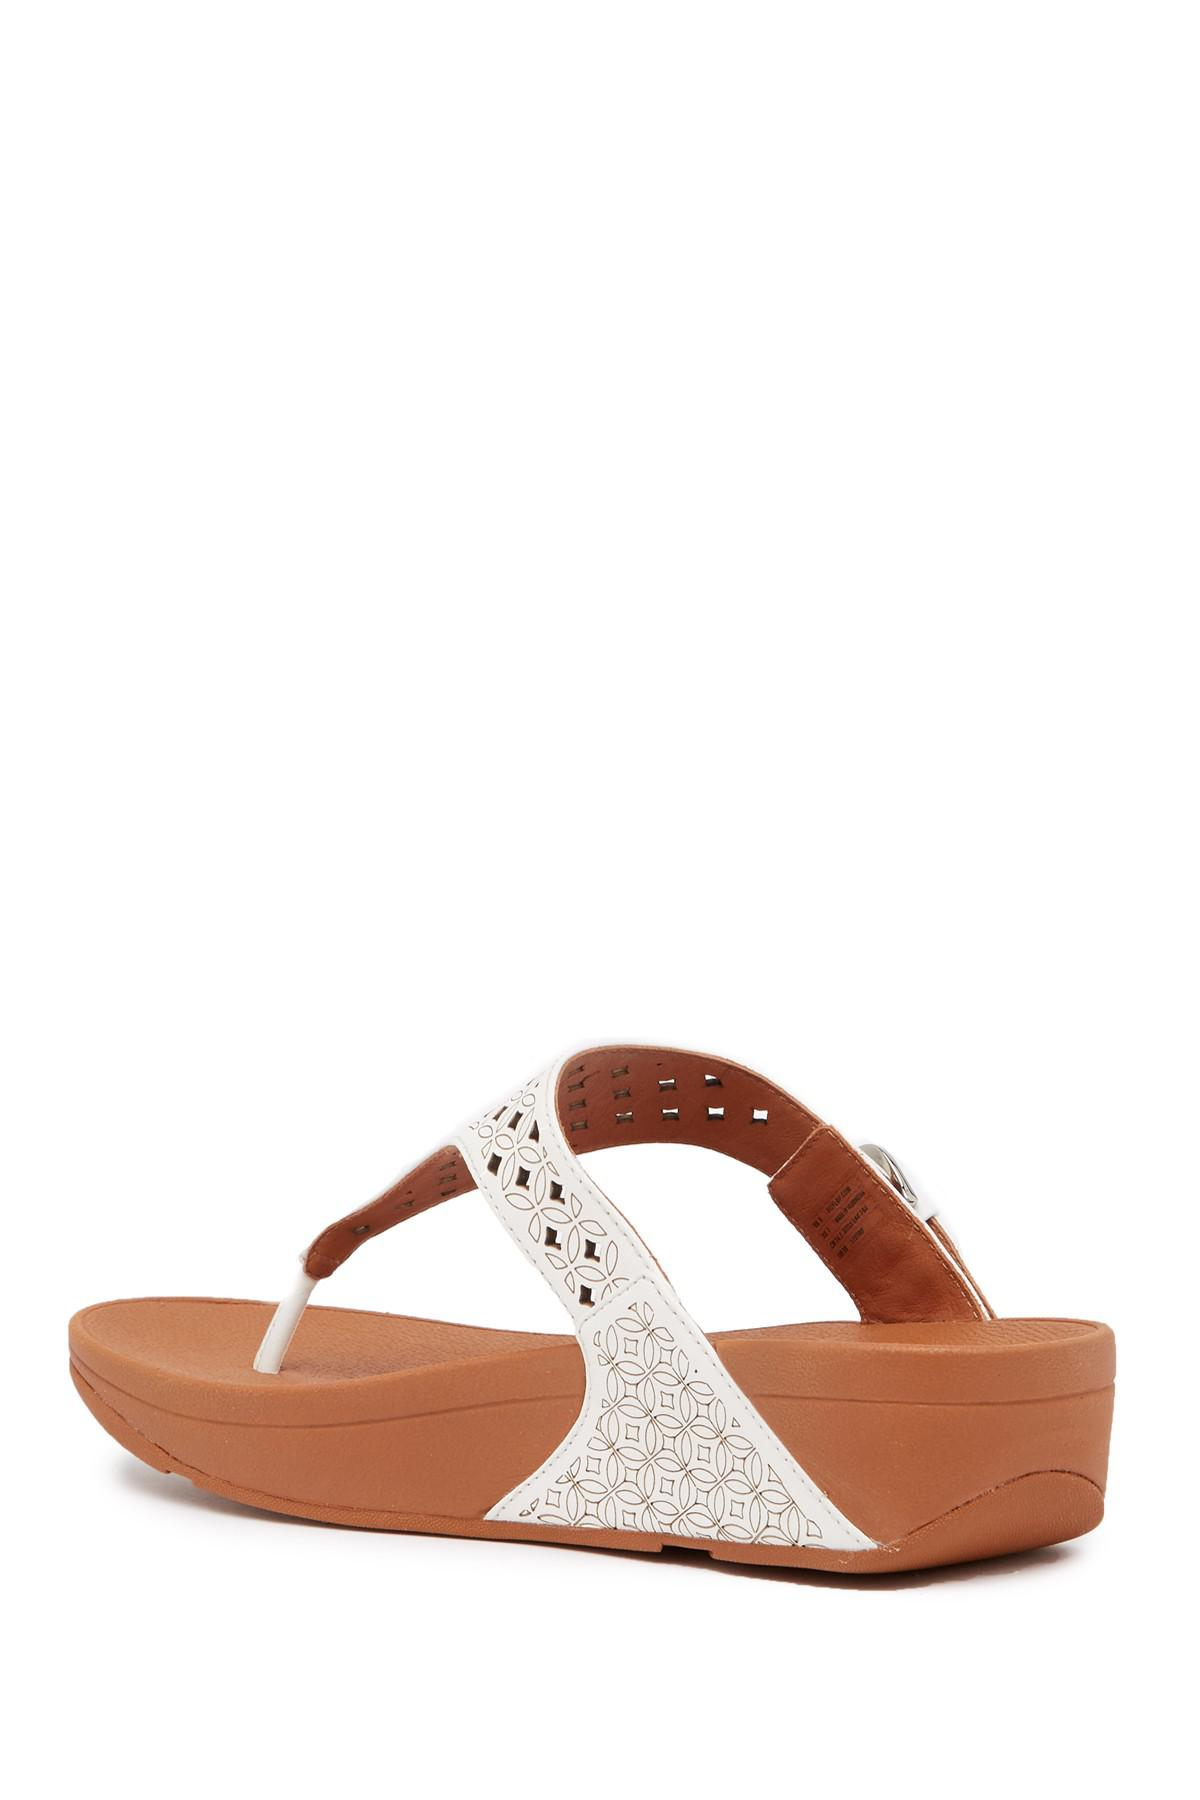 8d5a1613b Fitflop - Brown Skinny Toe Post Lattice Wedge Sandal - Lyst. View fullscreen